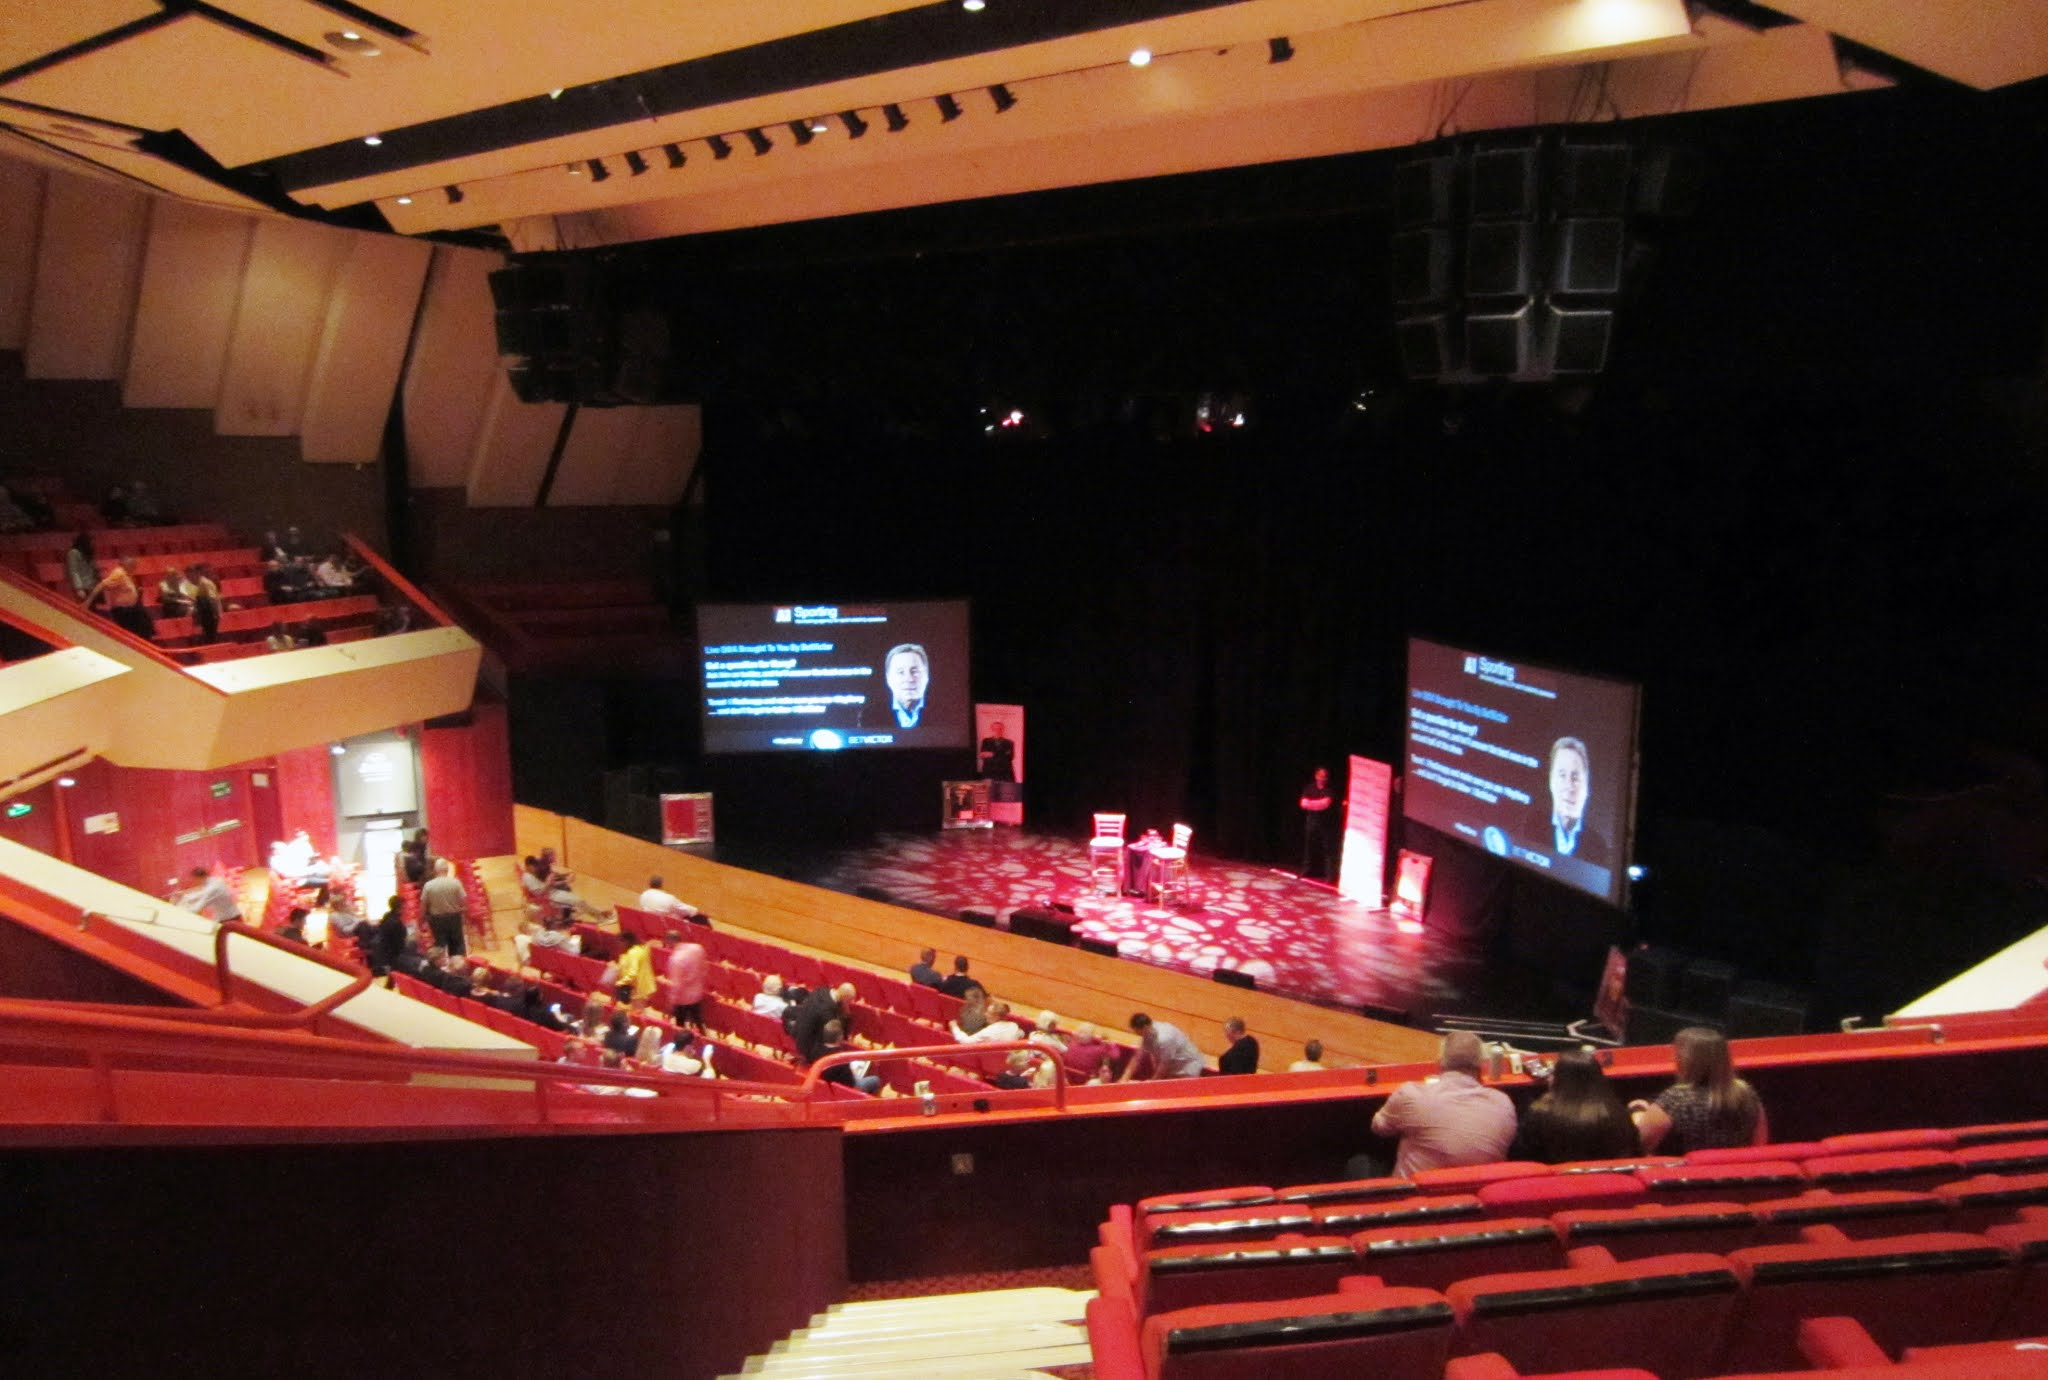 The auditorium inside The Hexagon theatre in Reading